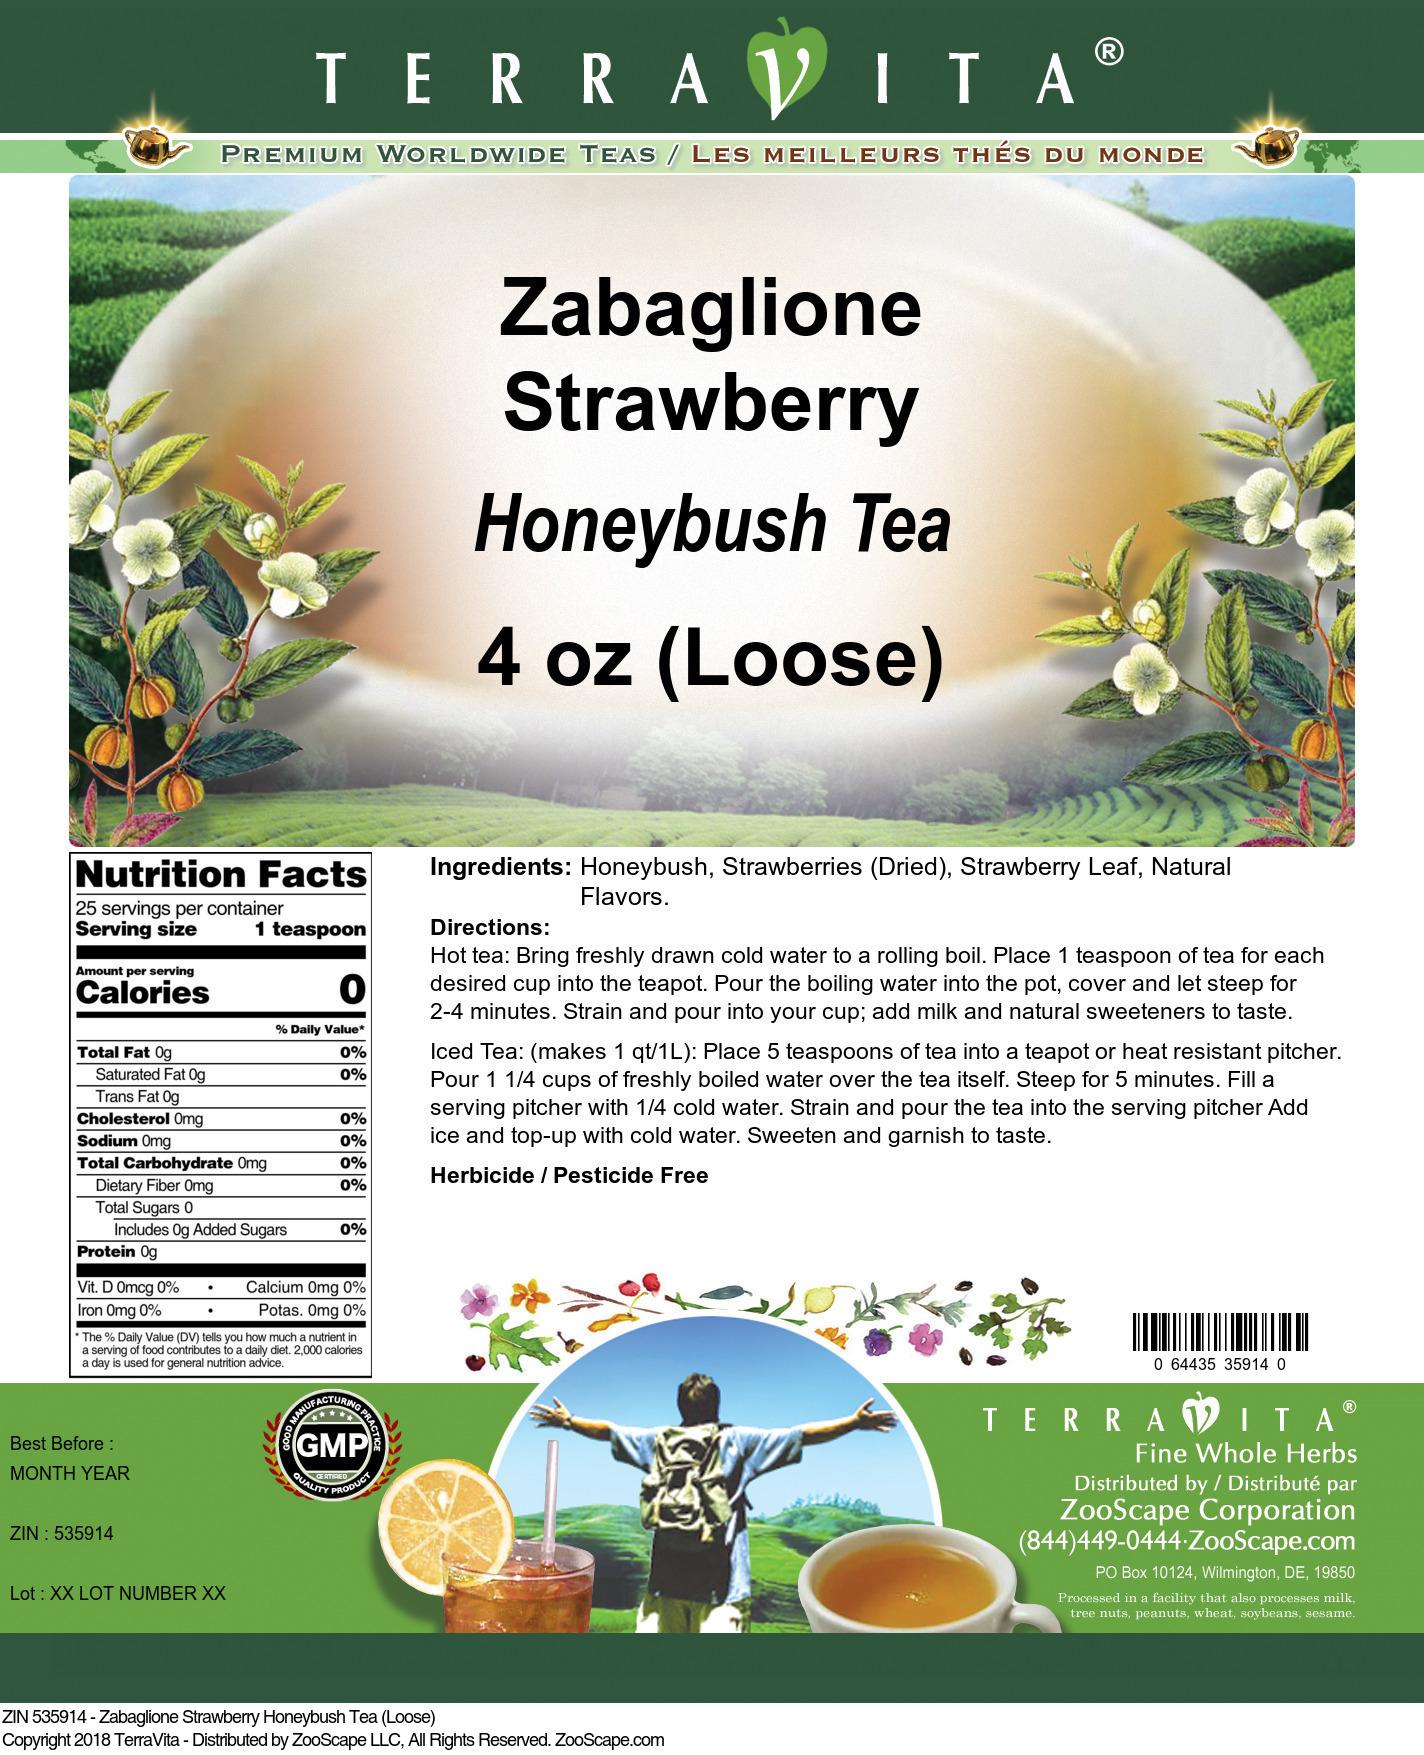 Zabaglione Strawberry Honeybush Tea (Loose)